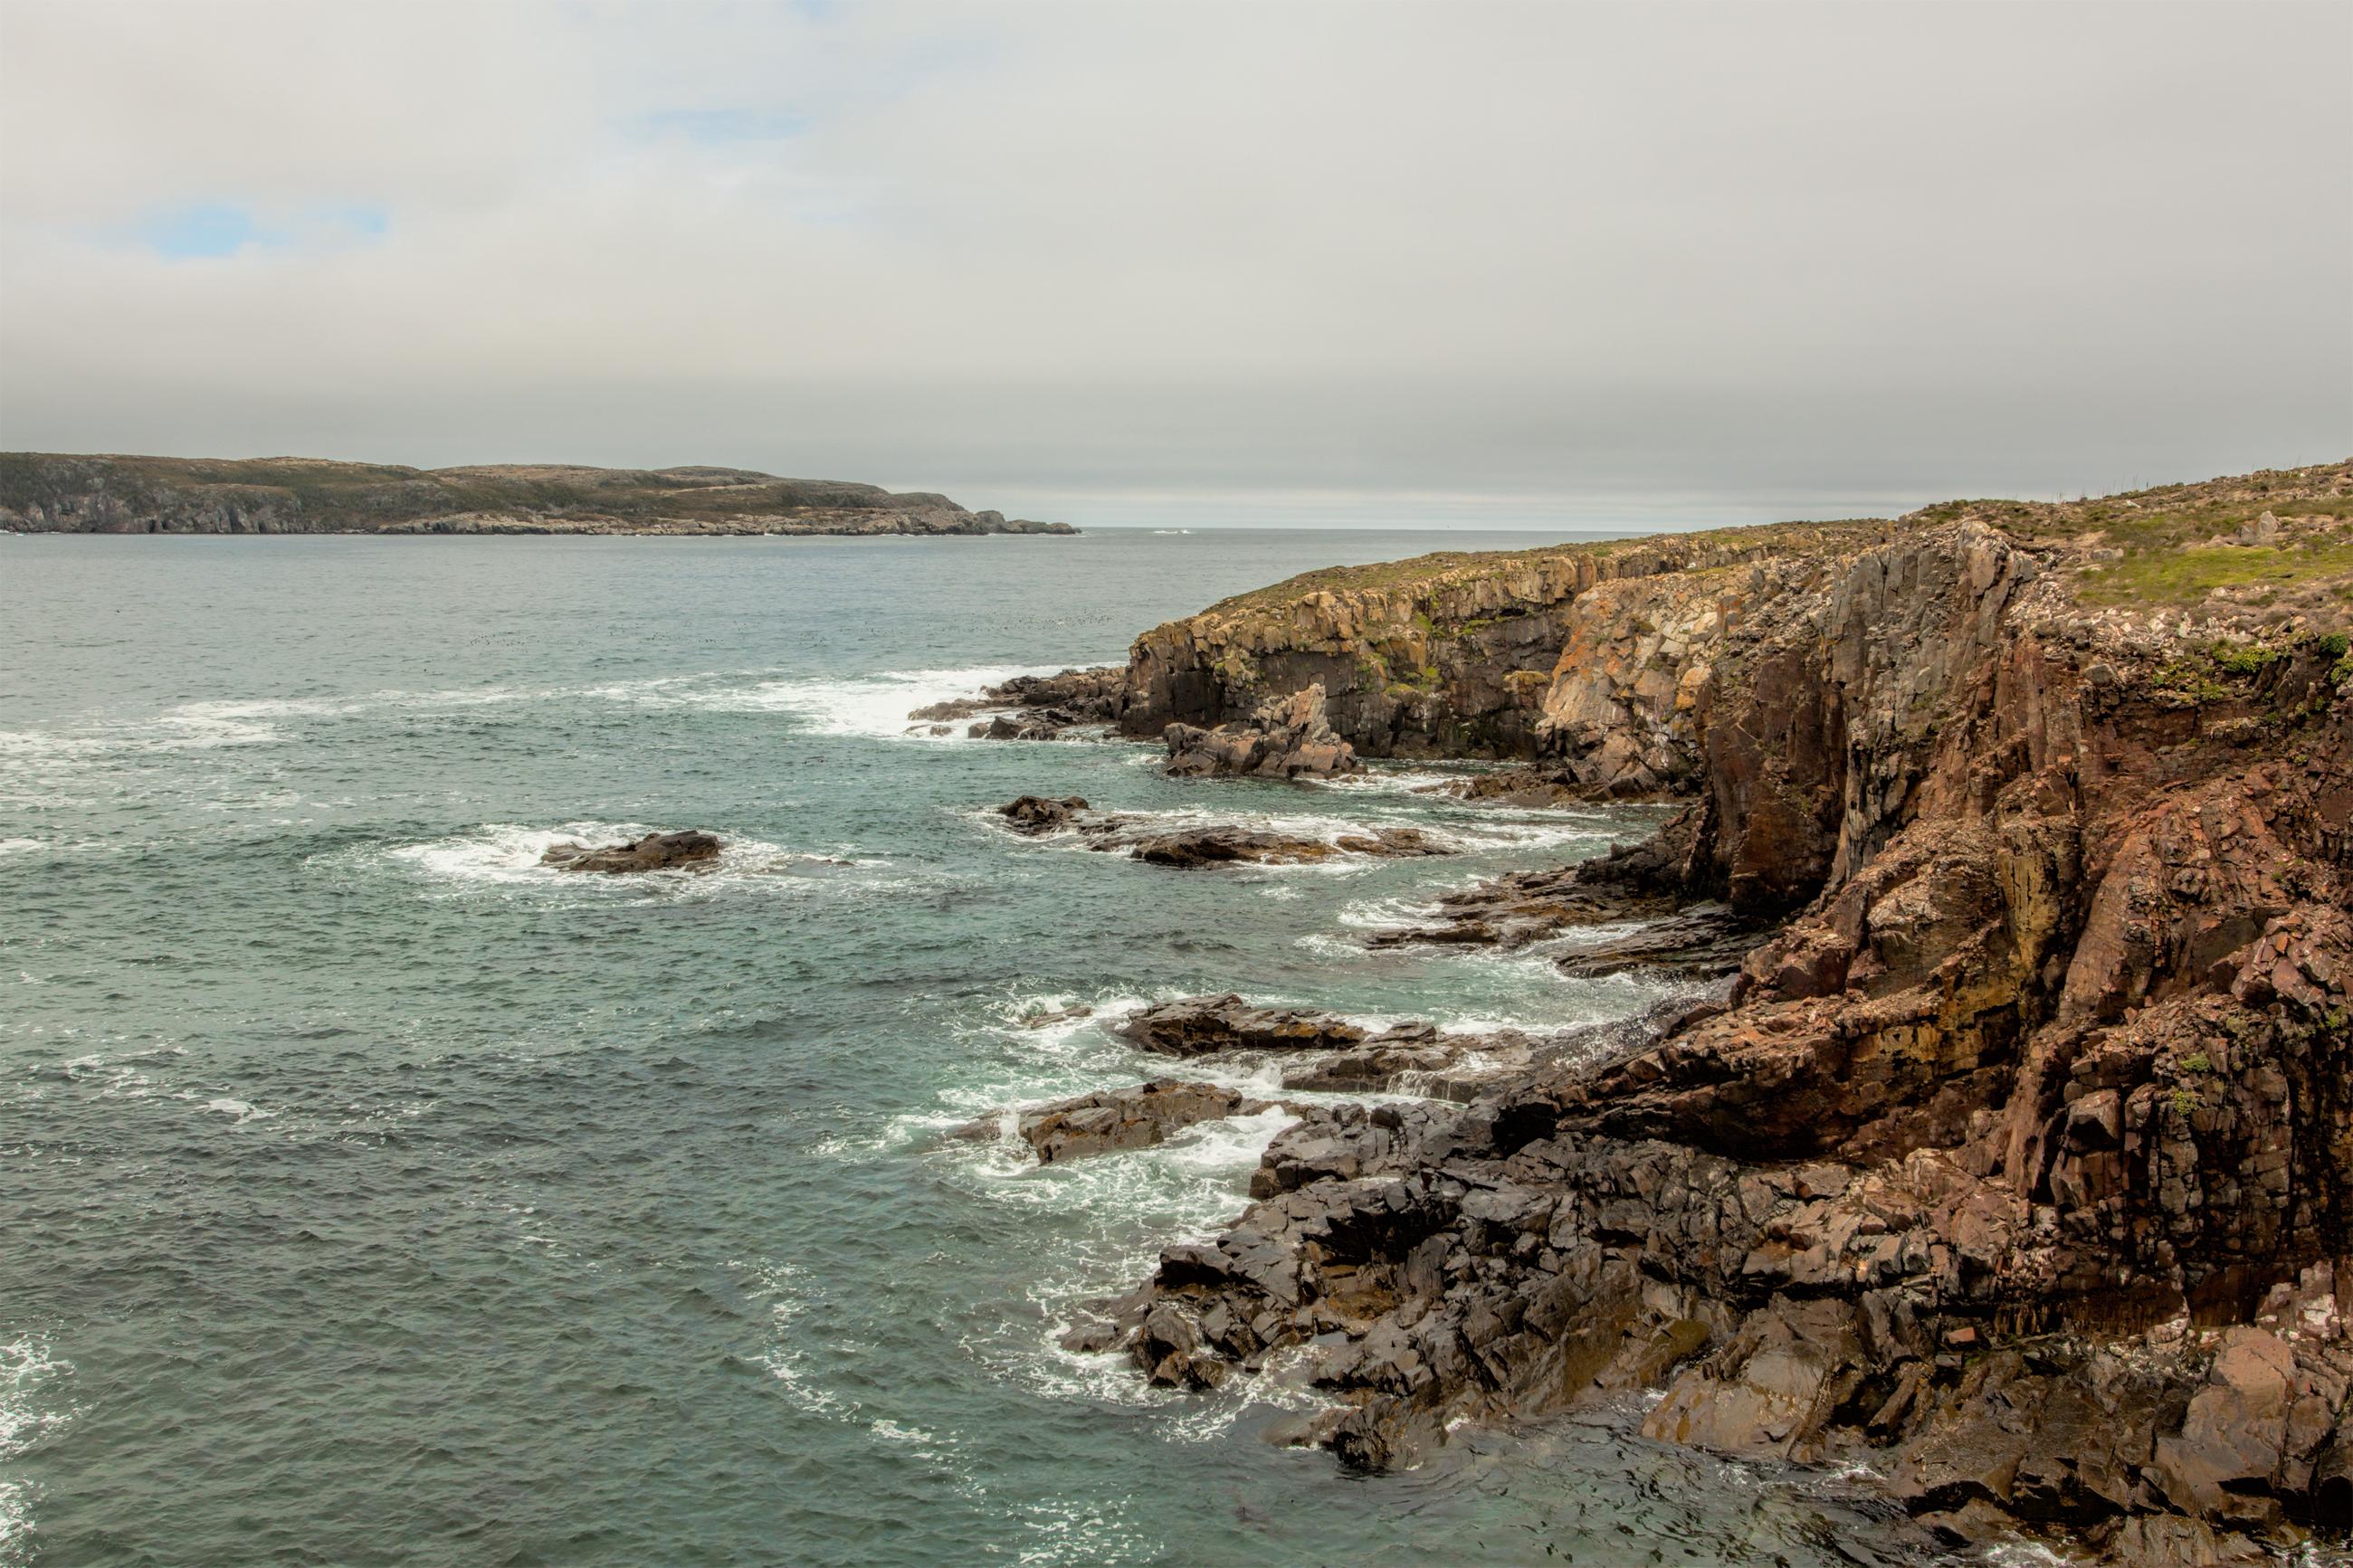 Atlantic canada coastline photo